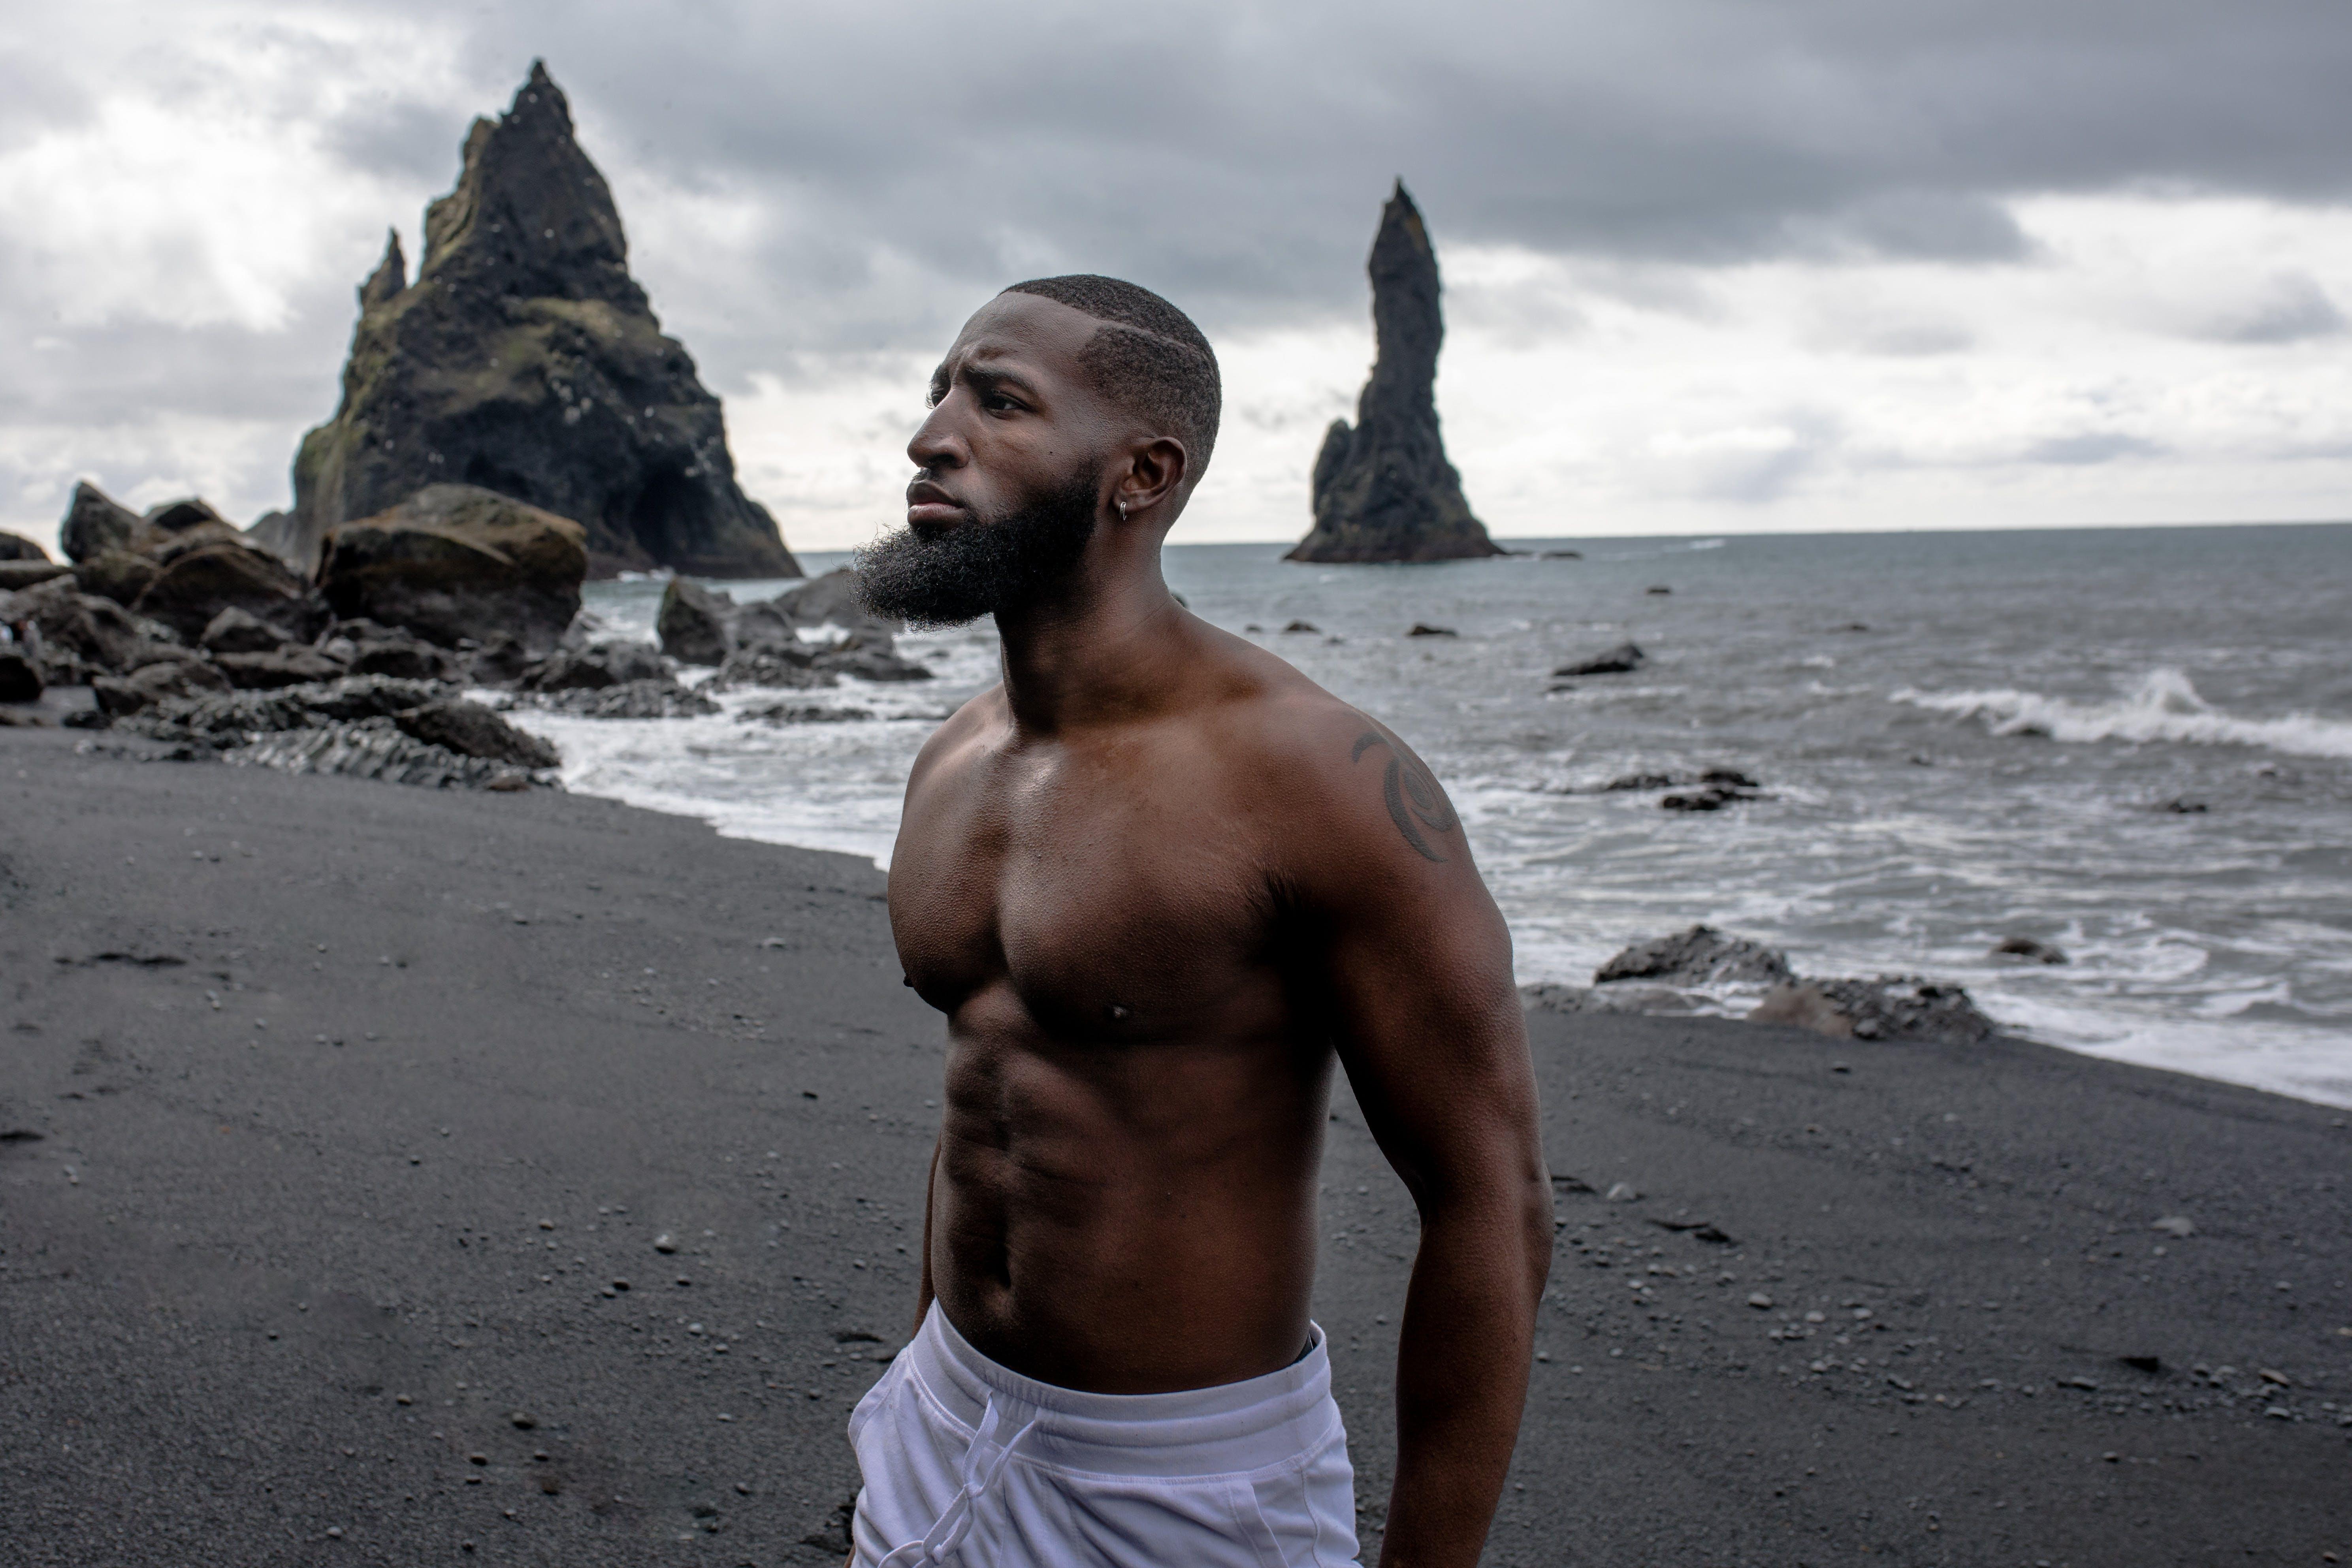 Man Wearing White Bottoms Near Body of Water